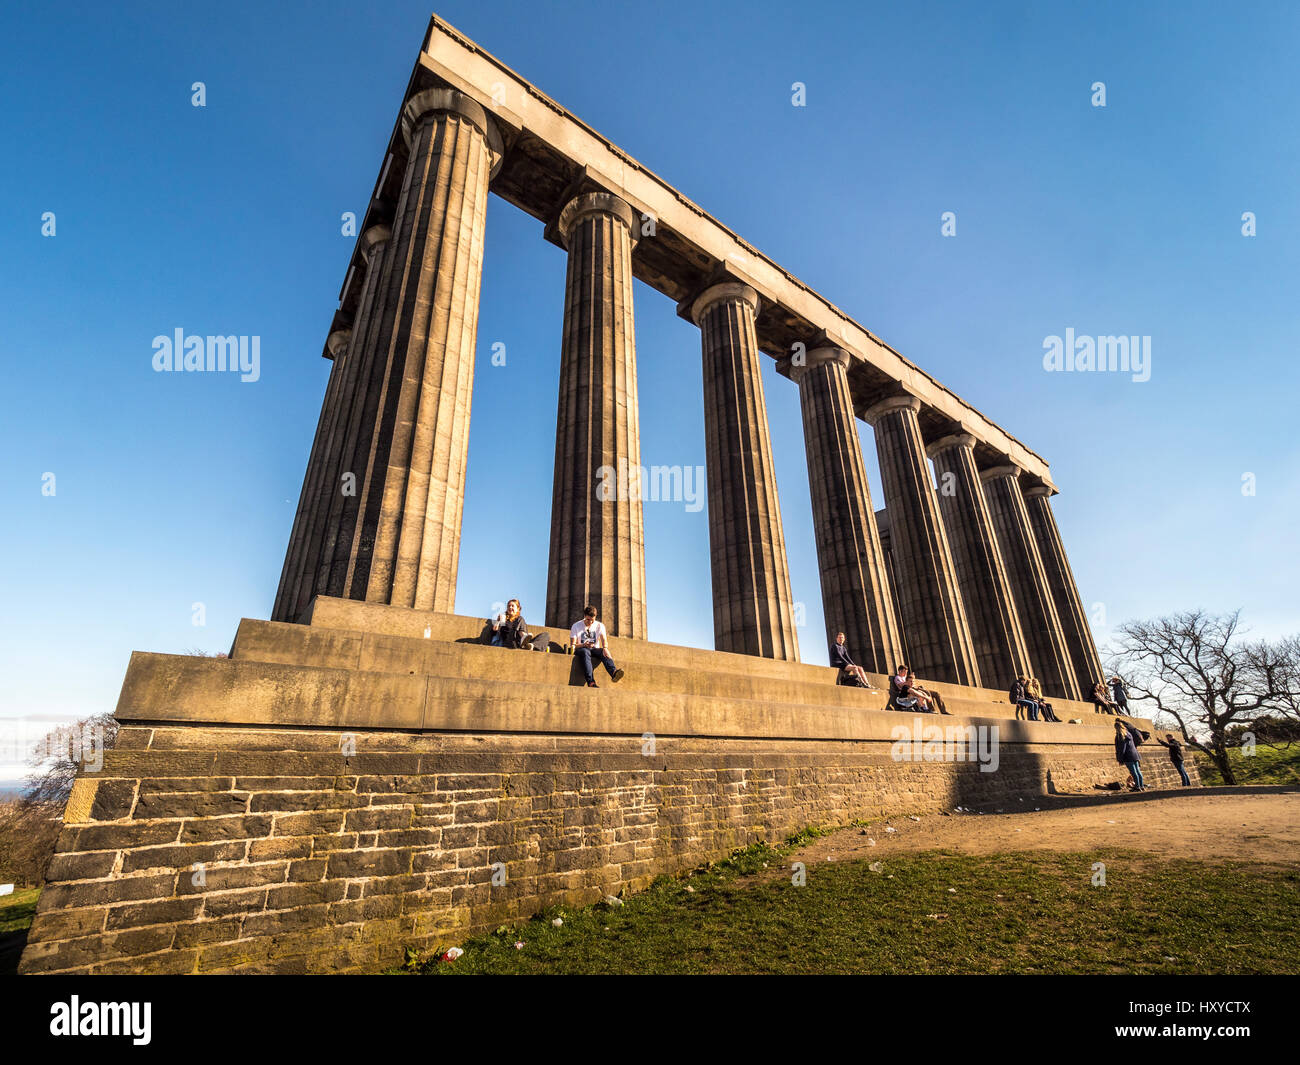 National Monument of Scotland, Calton Hill, Edinburgh, Scotland. Stock Photo